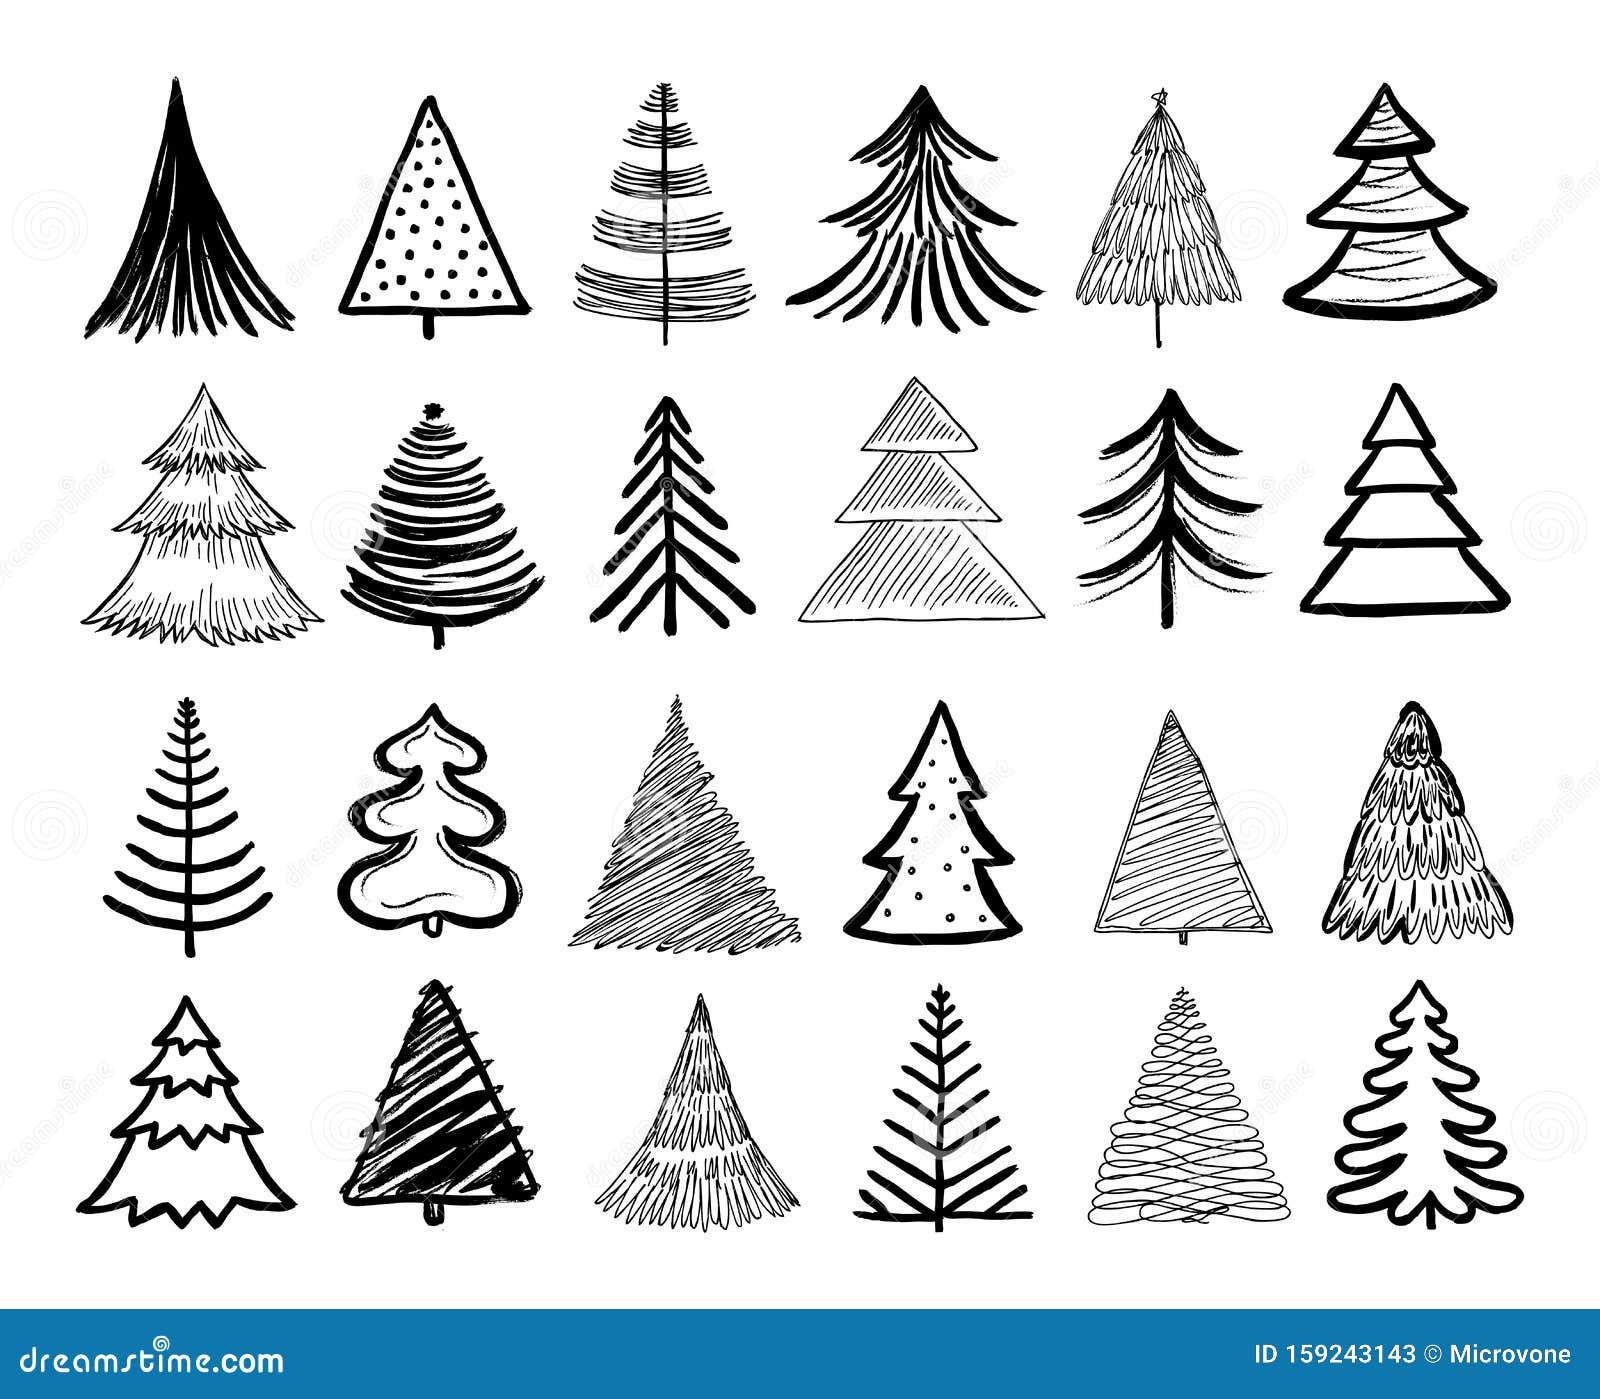 Pencil Sketch Christmas Tree Stock Illustrations 1 470 Pencil Sketch Christmas Tree Stock Illustrations Vectors Clipart Dreamstime